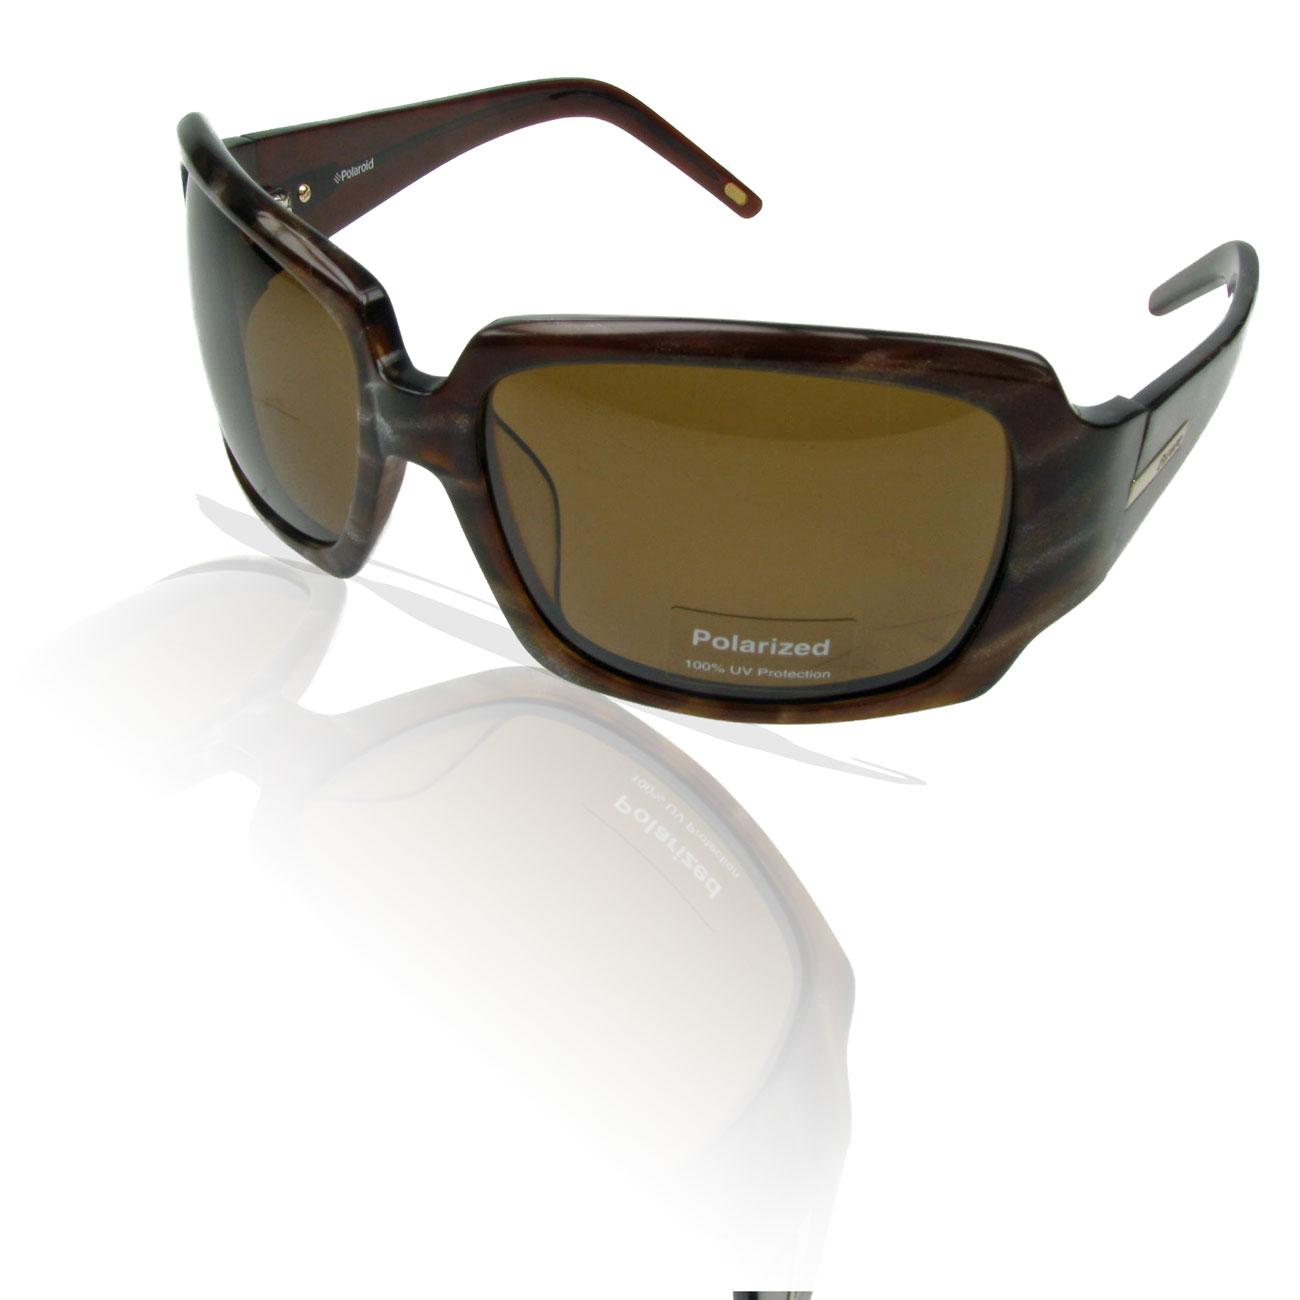 ea184a0c39 Ladies Sunglasses Polaroid Polarized Lens UV400 CAT 3 Driving 6754B  Scratched